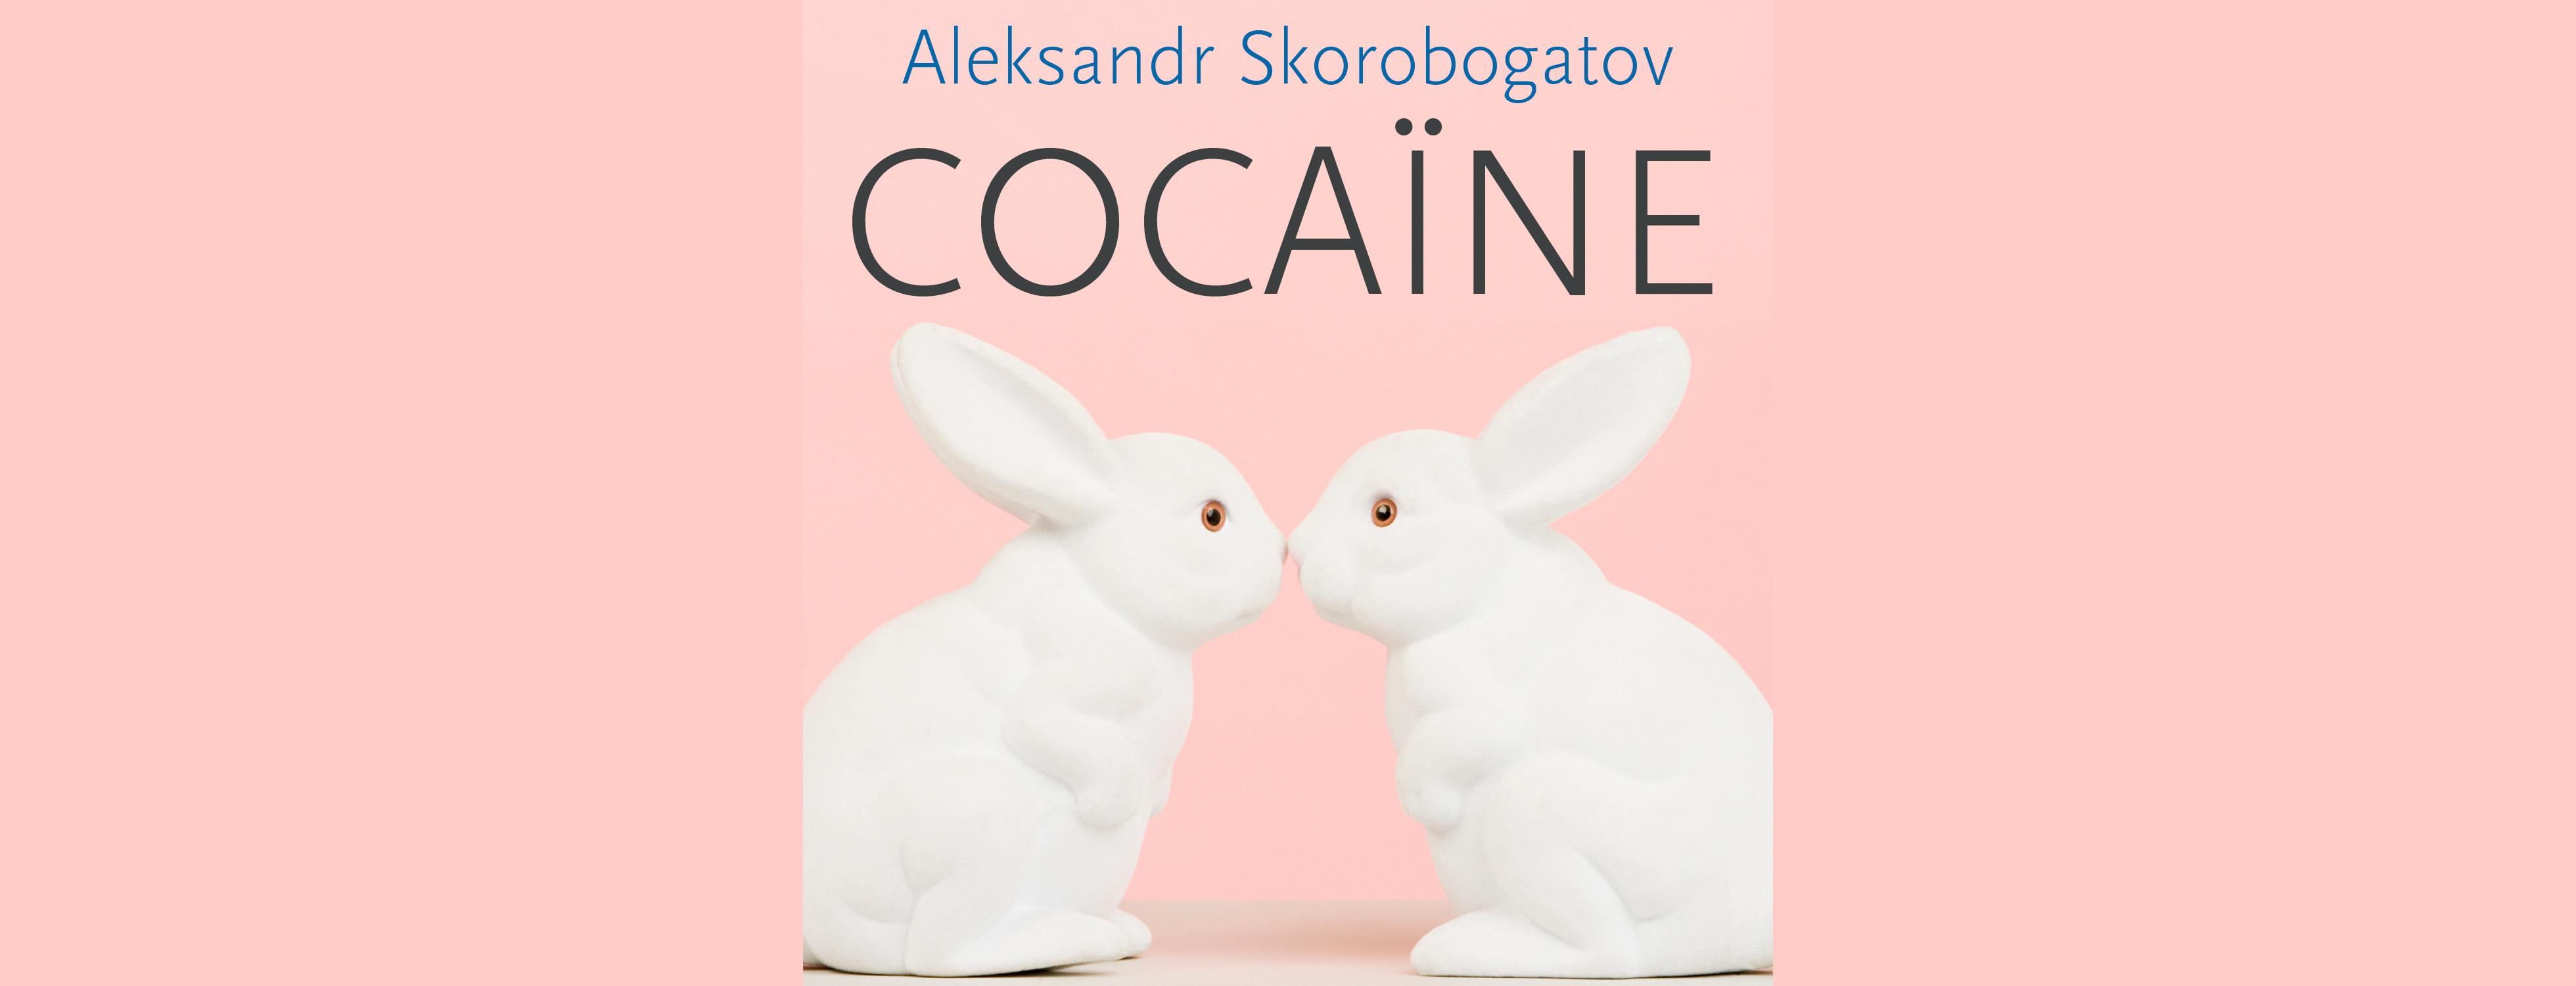 cocaine-aleksandr-skorobogatov